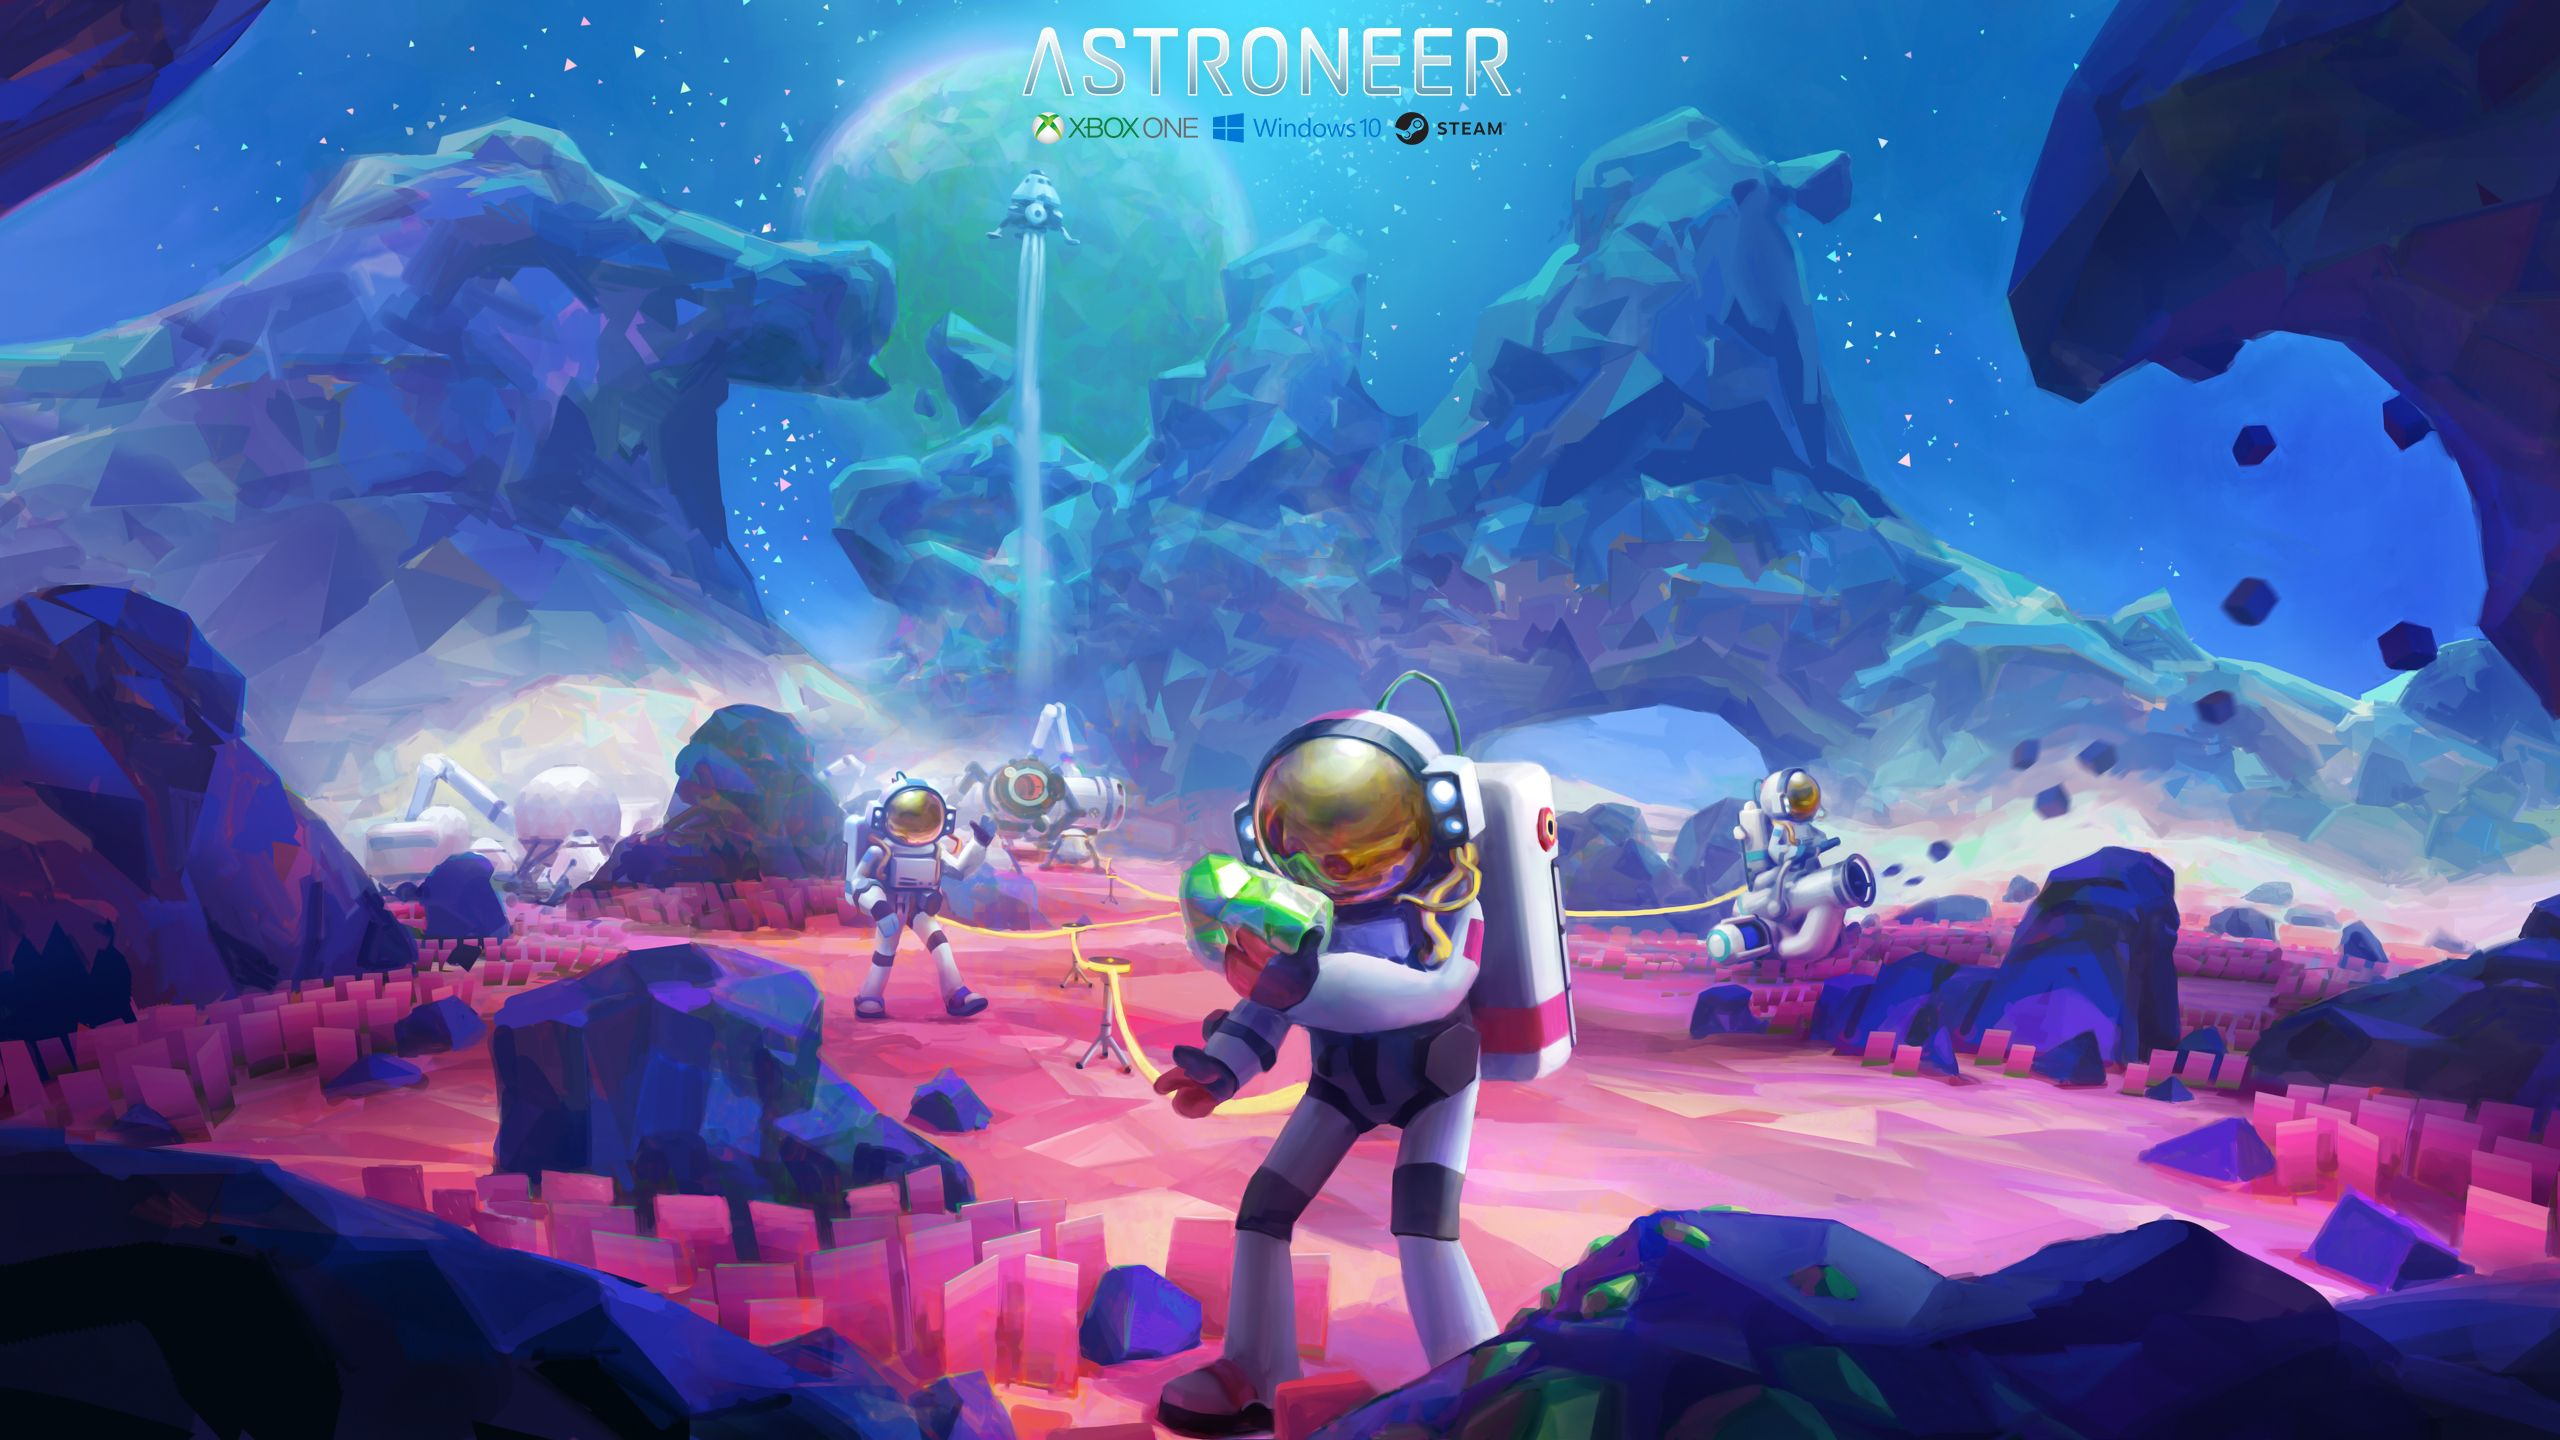 Astroneer Wallpaper 1440p 02 Jpg 2560 1440 Sky Artwork Environment Concept Art Concept Art